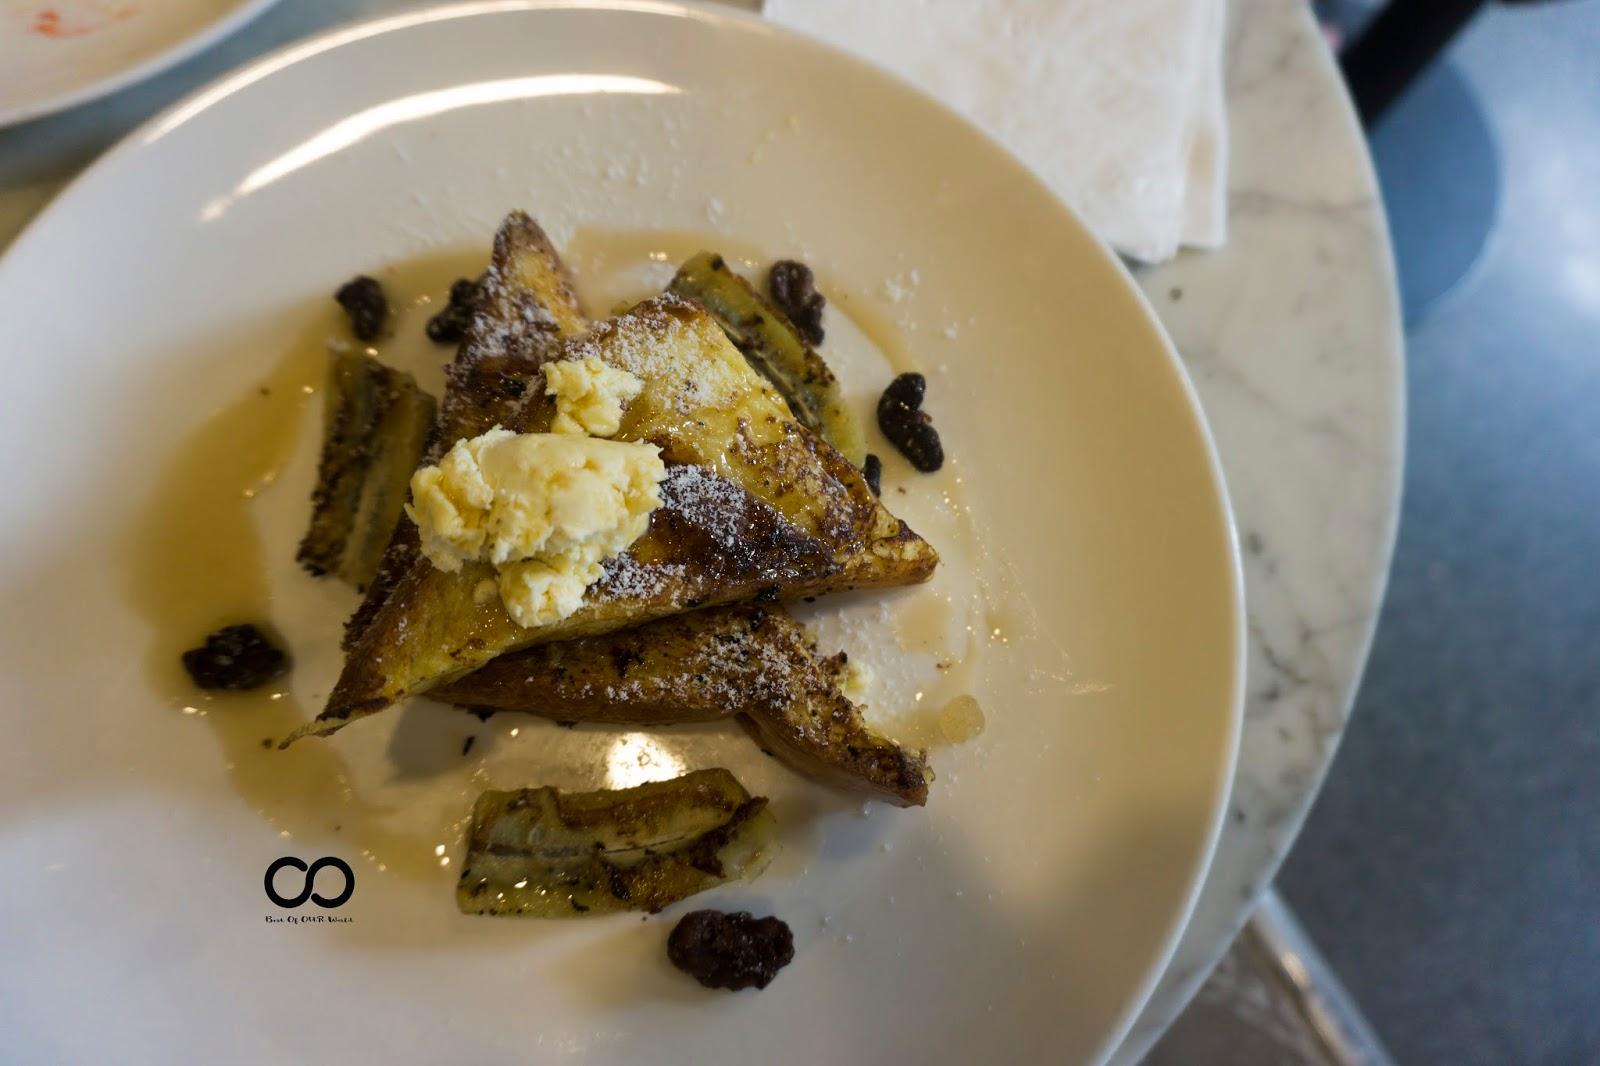 Banana and Ricotta Cheese French Toast (2 pcs)